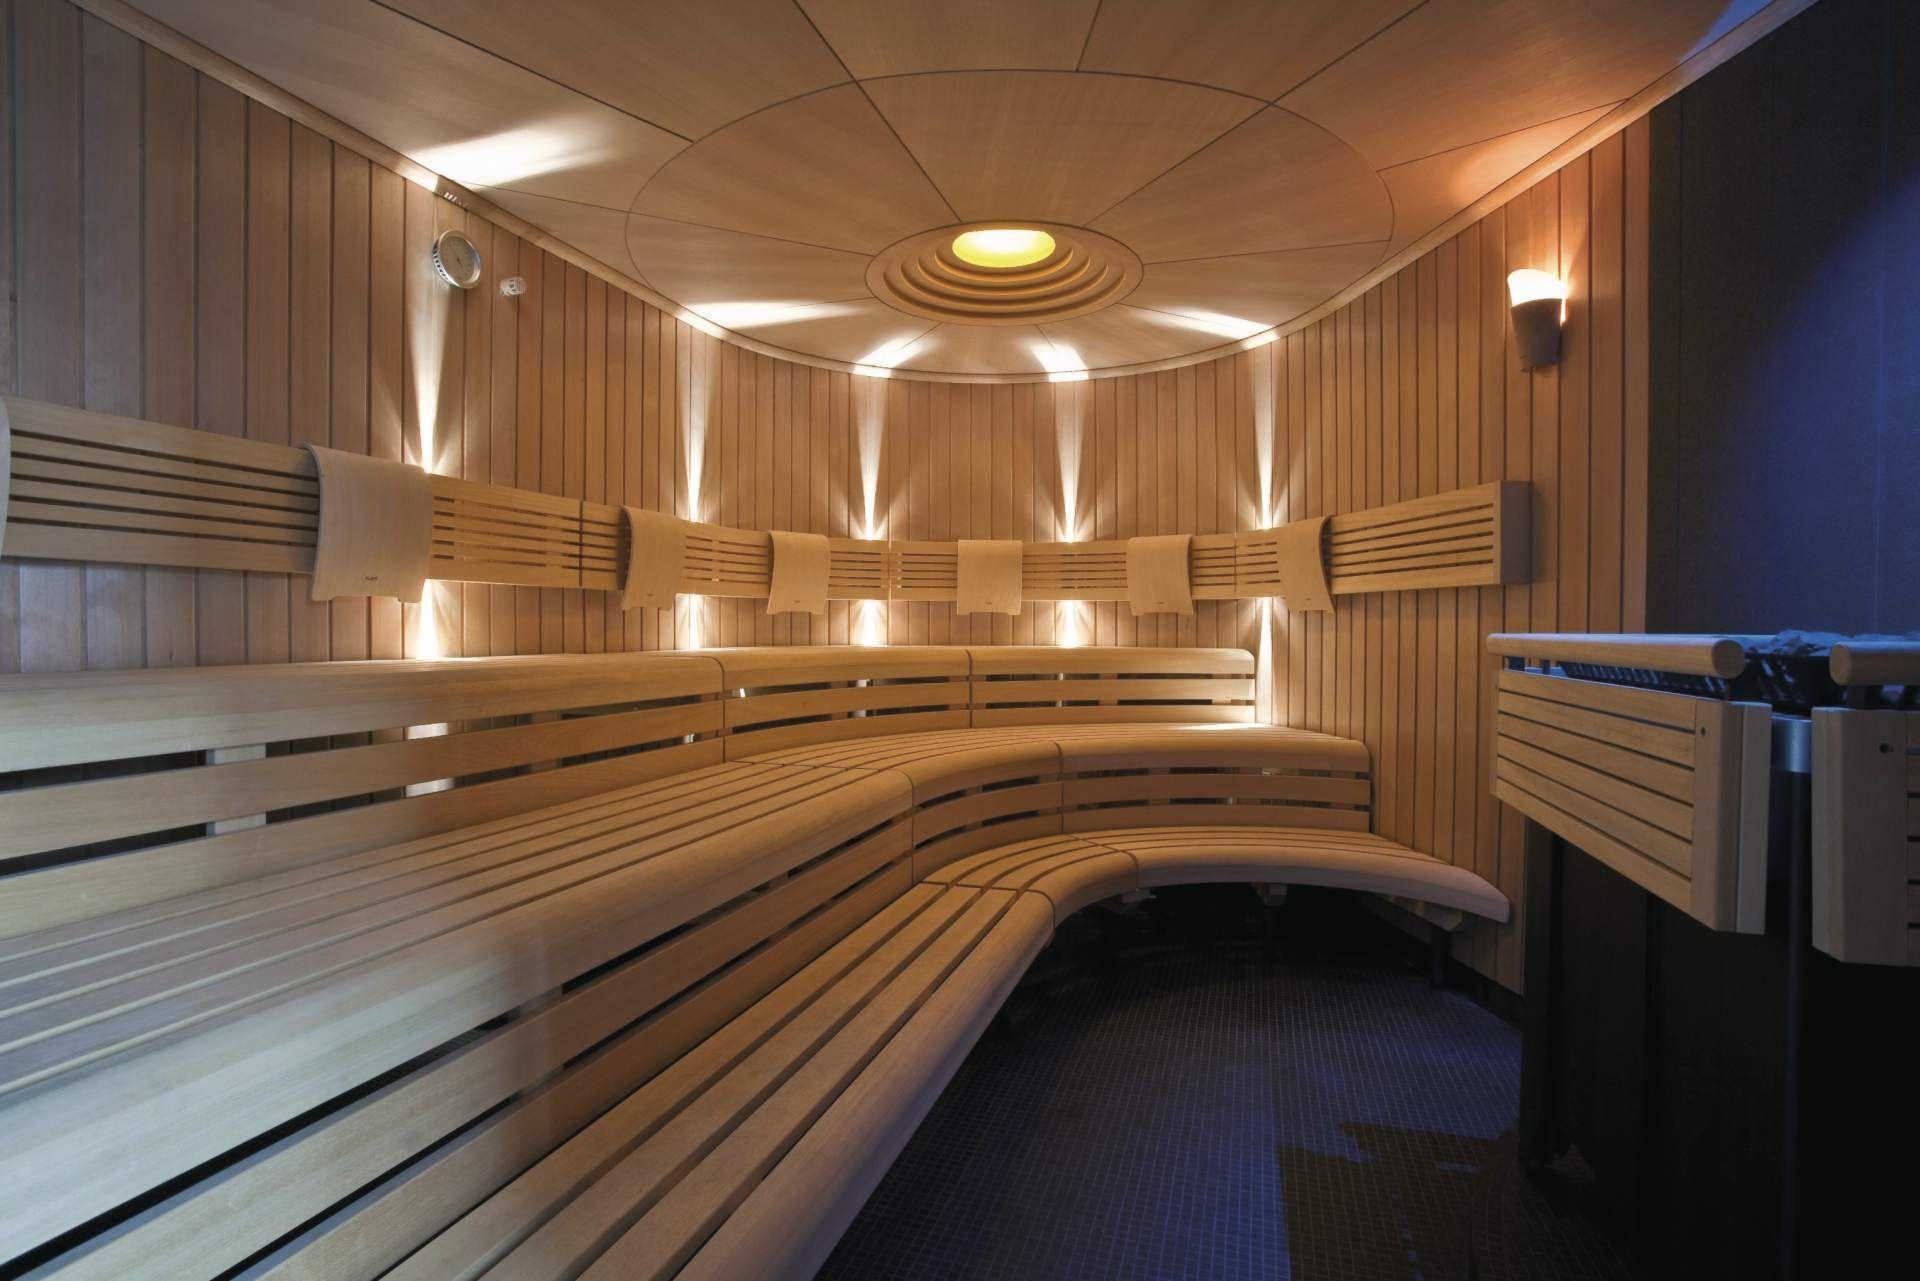 Klafs Sauna With Custom Curved Benches #Klafs #Bespoke #Custom #Design